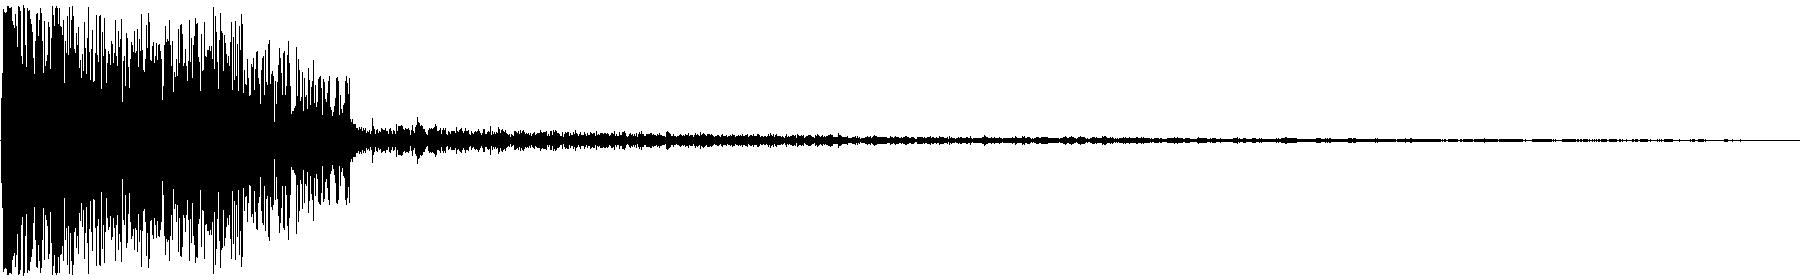 vk snarepunchy 01